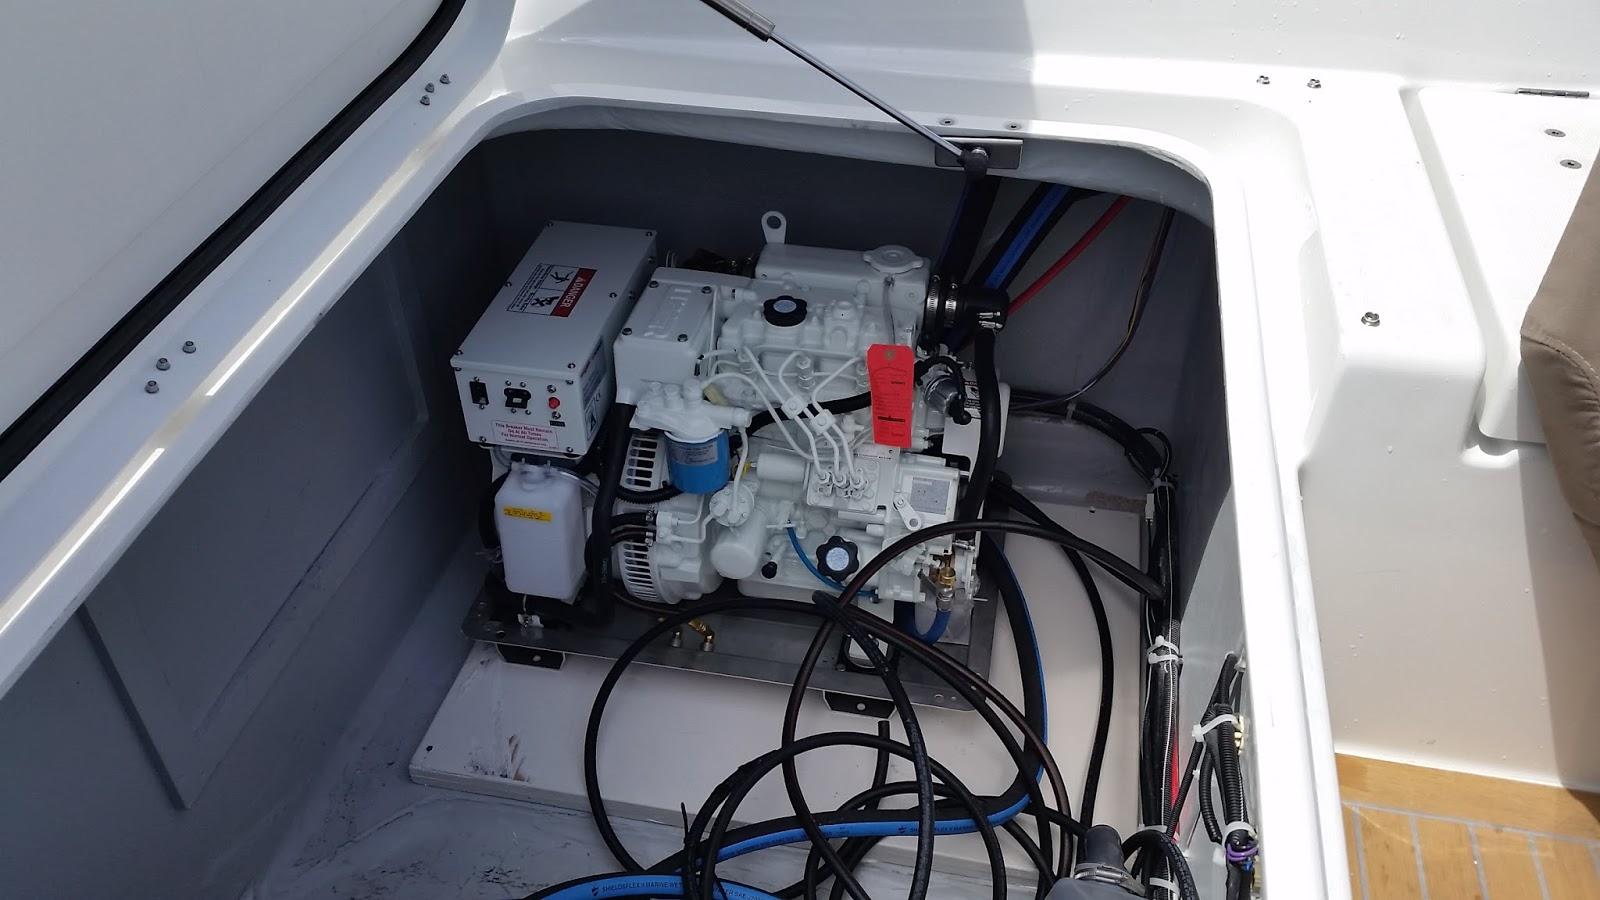 hight resolution of http www northern lights com recreational marine marine generators m673l3 65 kw